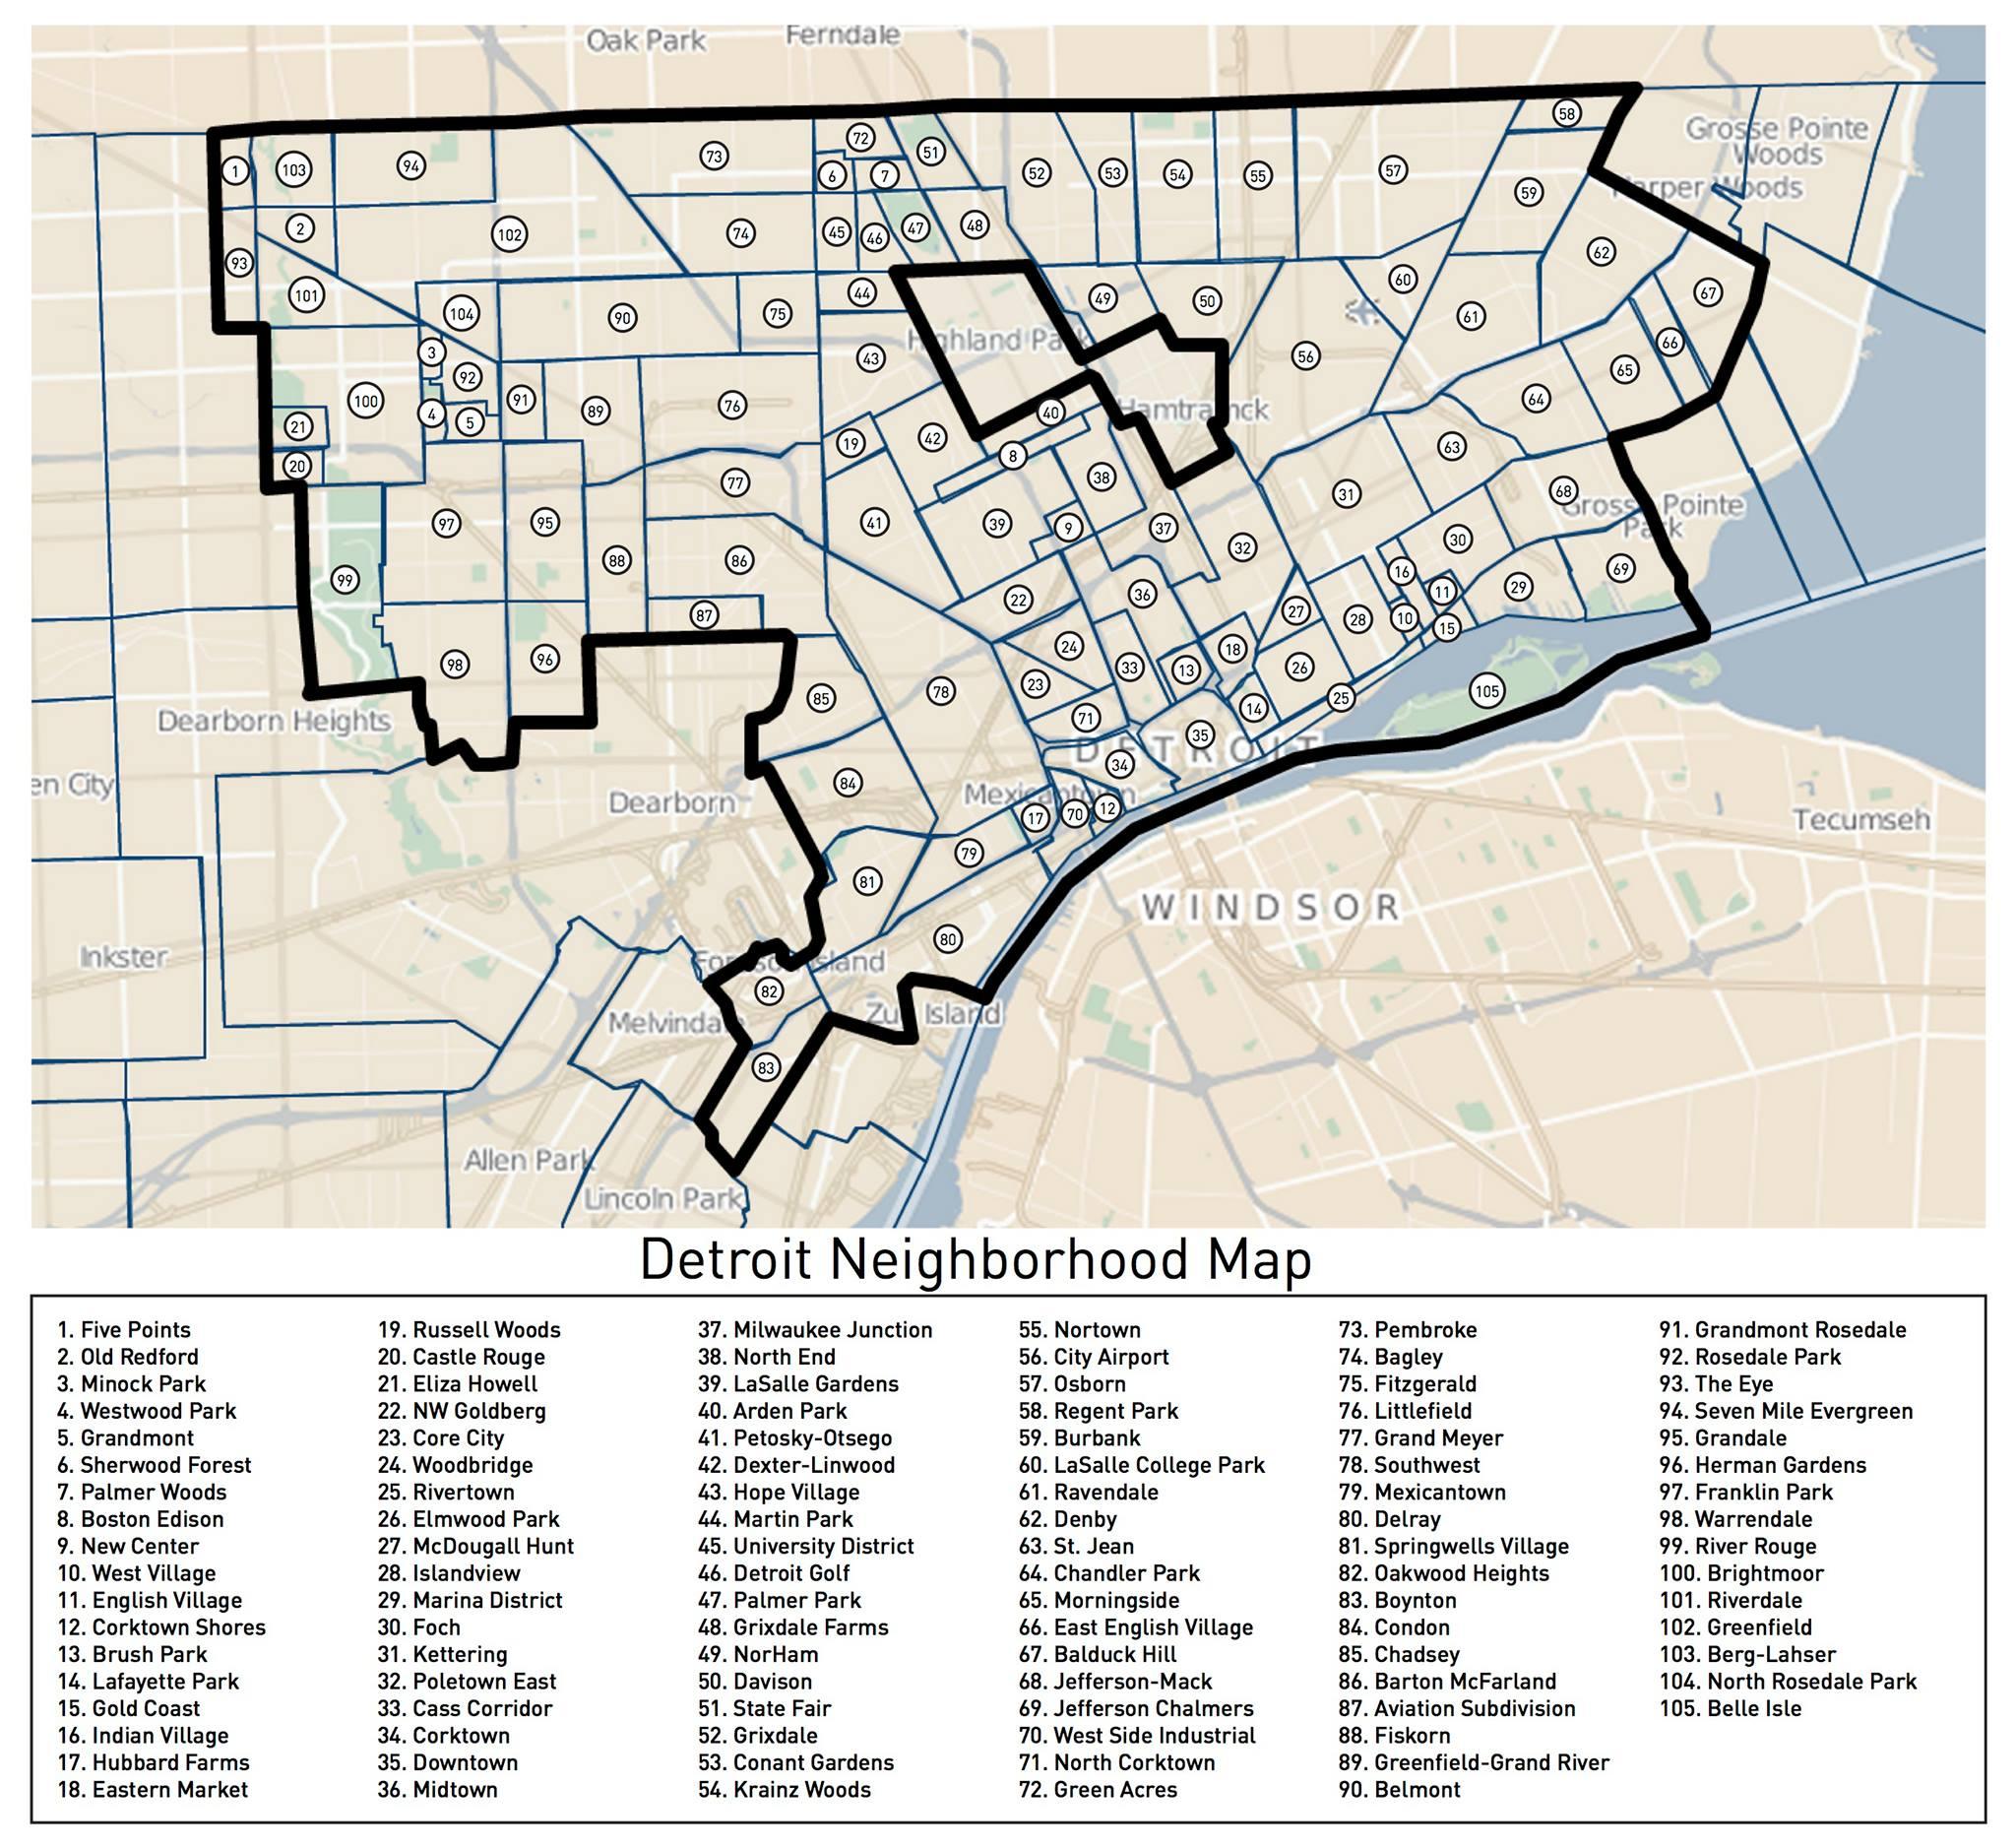 land's Detroit Neighborhoods Map | DETROITography on